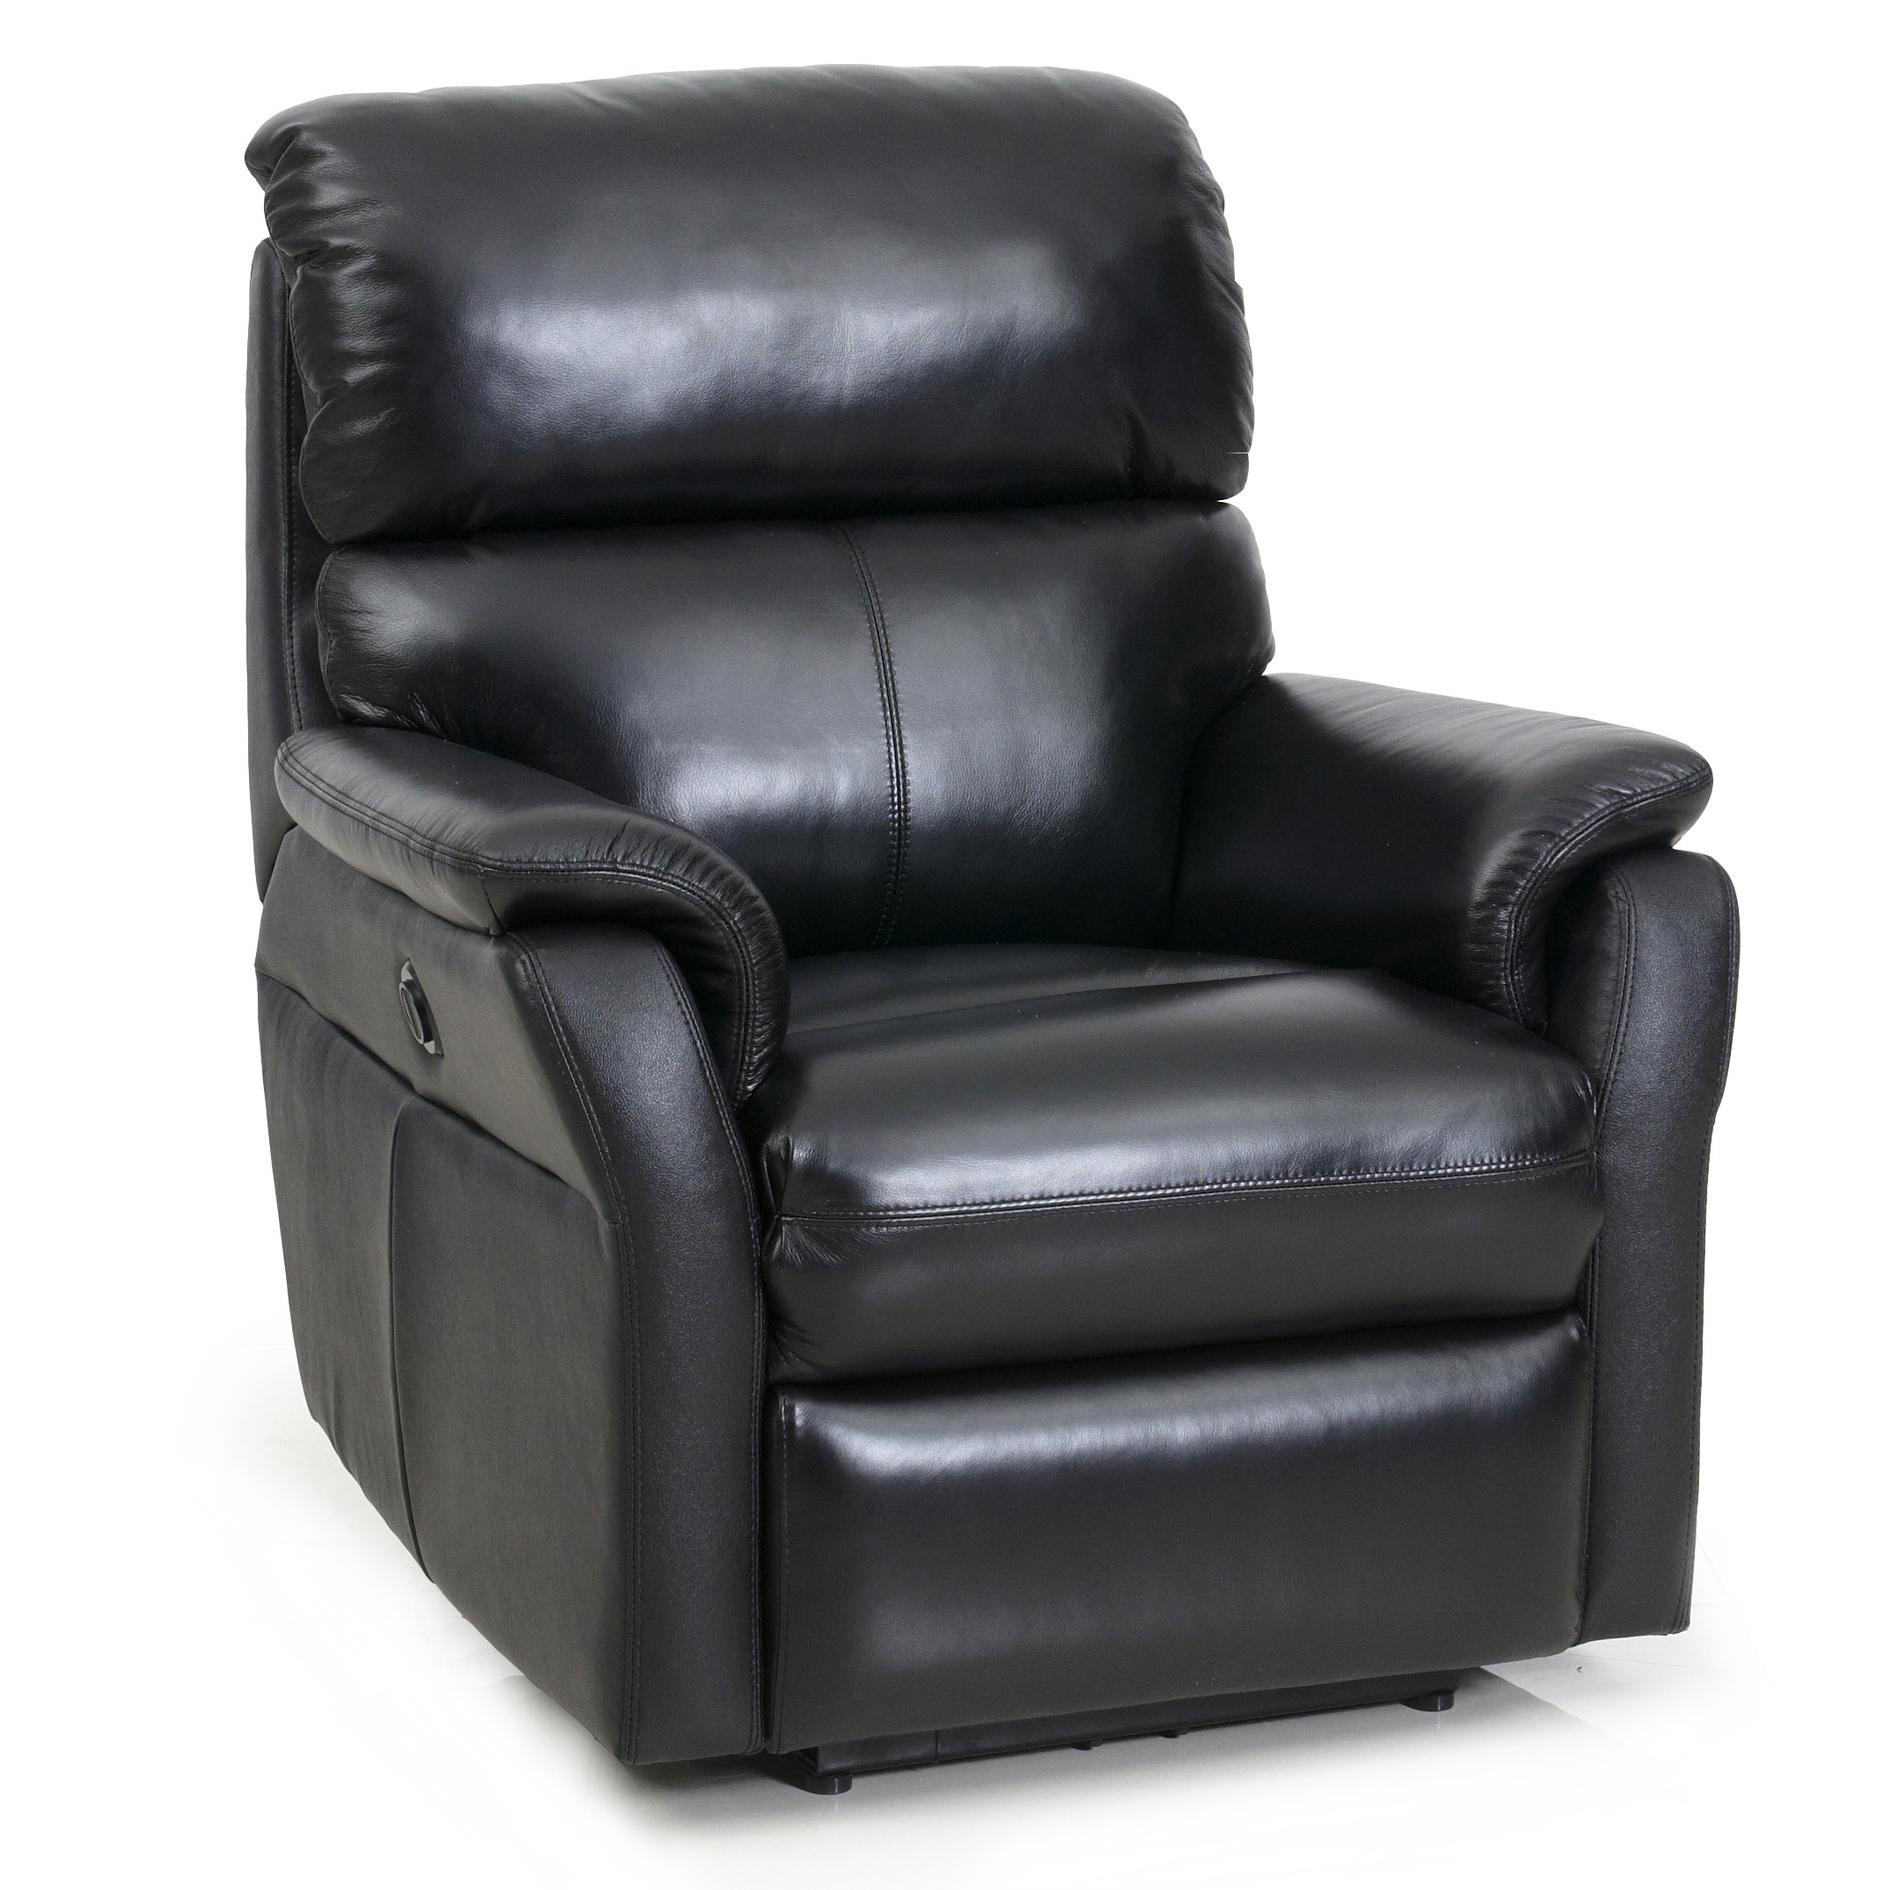 lay flat recliner chairs folding camping costco barcalounger cross ii wall proximity hugger chair black power tivoli leather